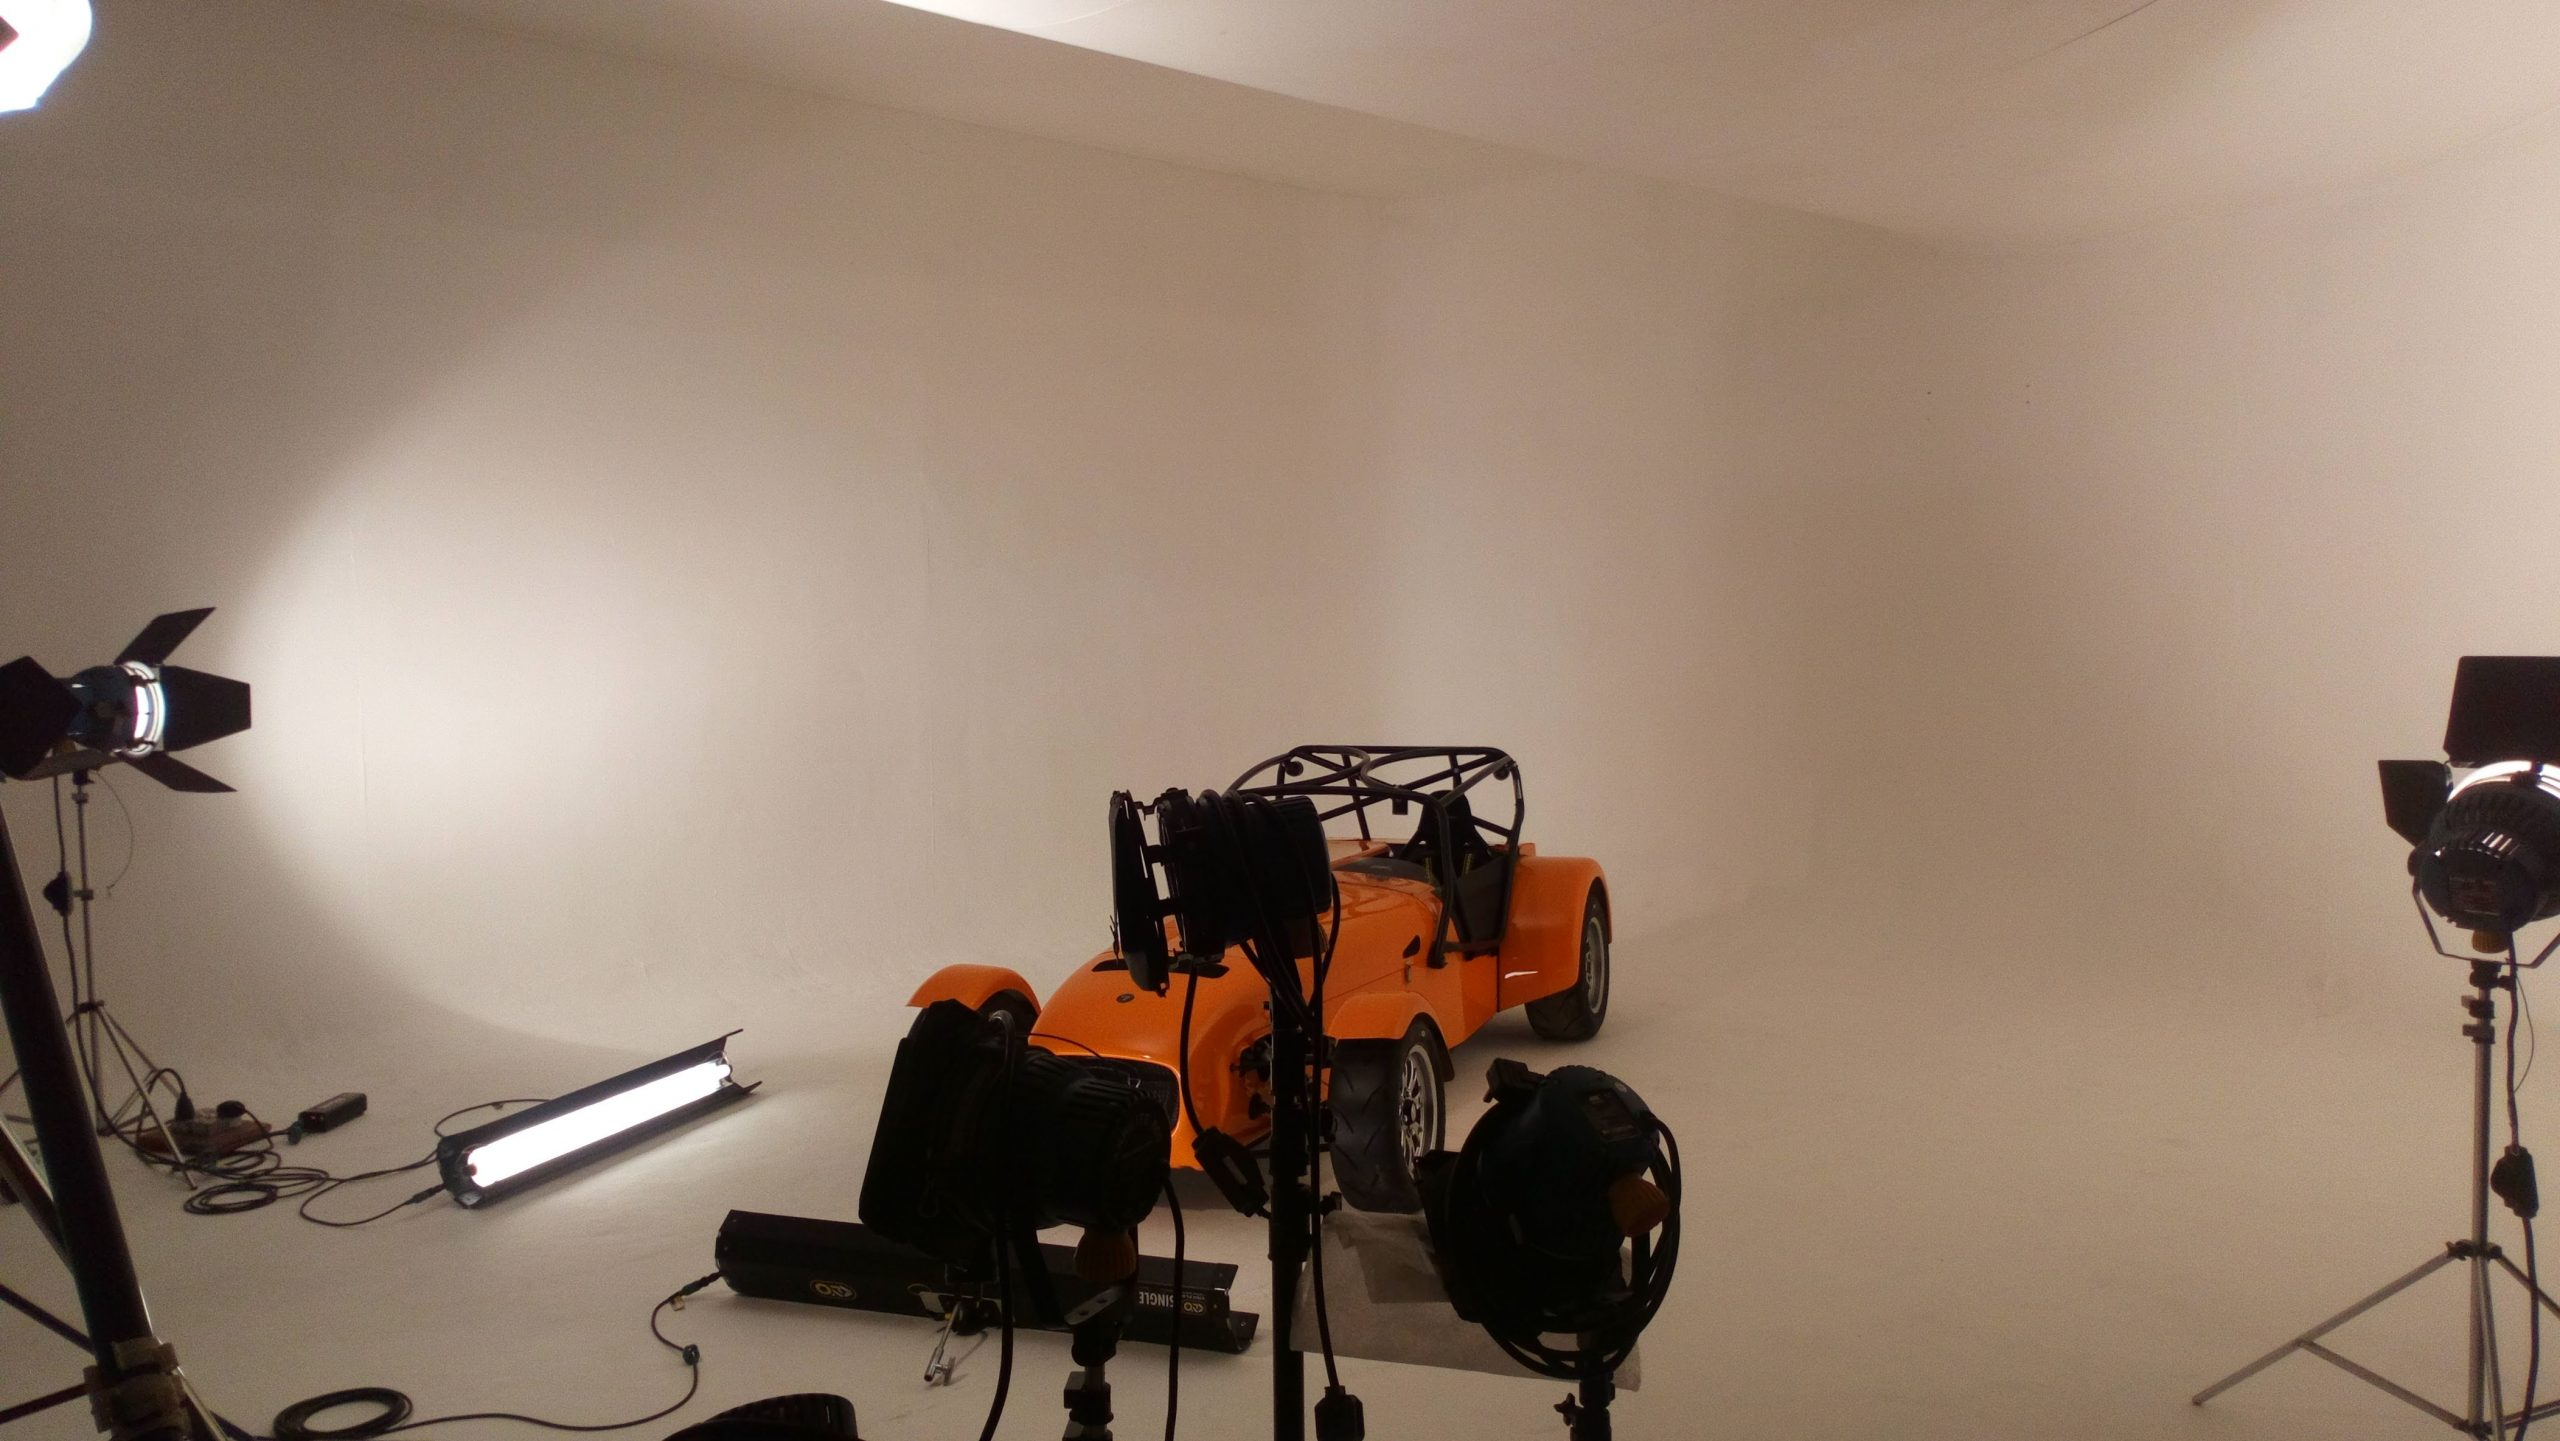 Futurist Media showroom video production